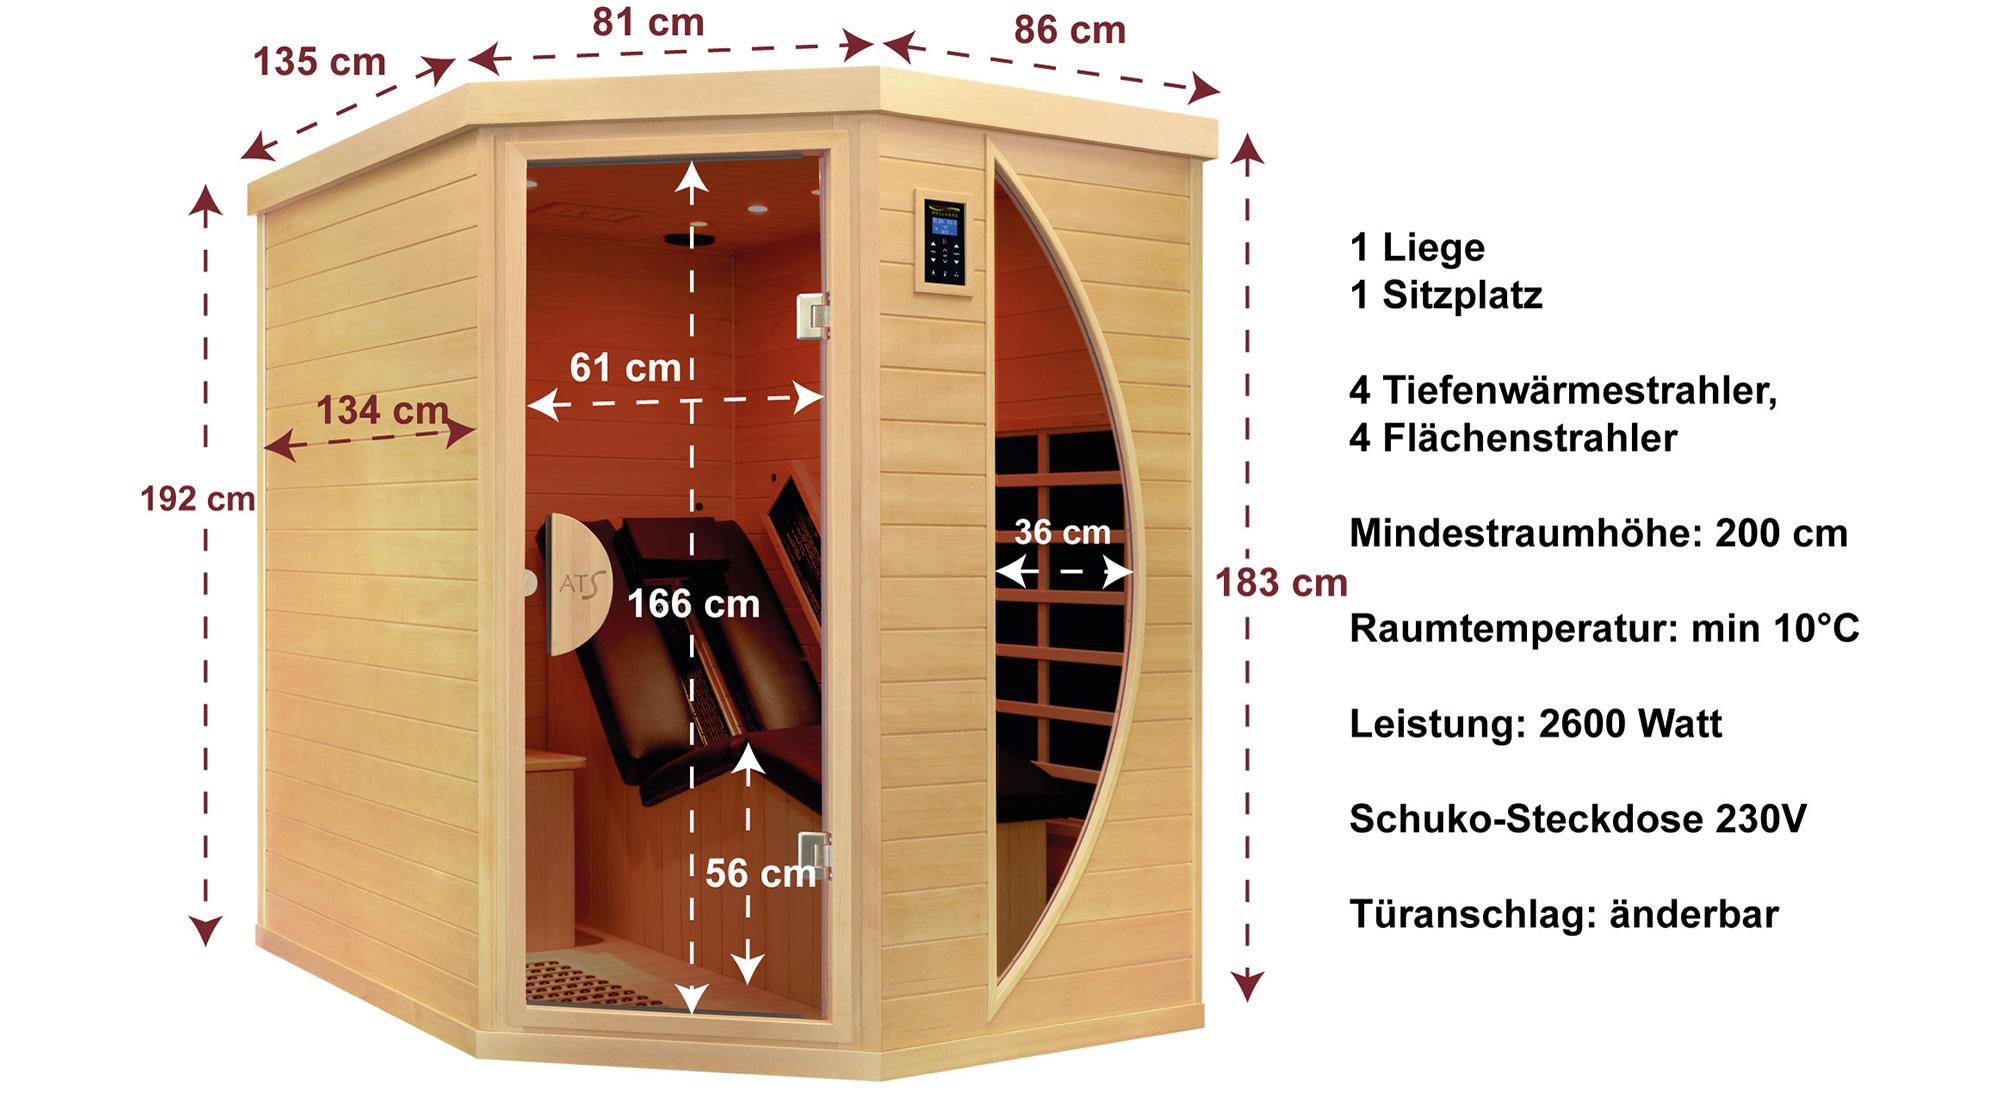 liegekabine ats relax 1 r die premium infrarotkabine mit tiefenw rme. Black Bedroom Furniture Sets. Home Design Ideas